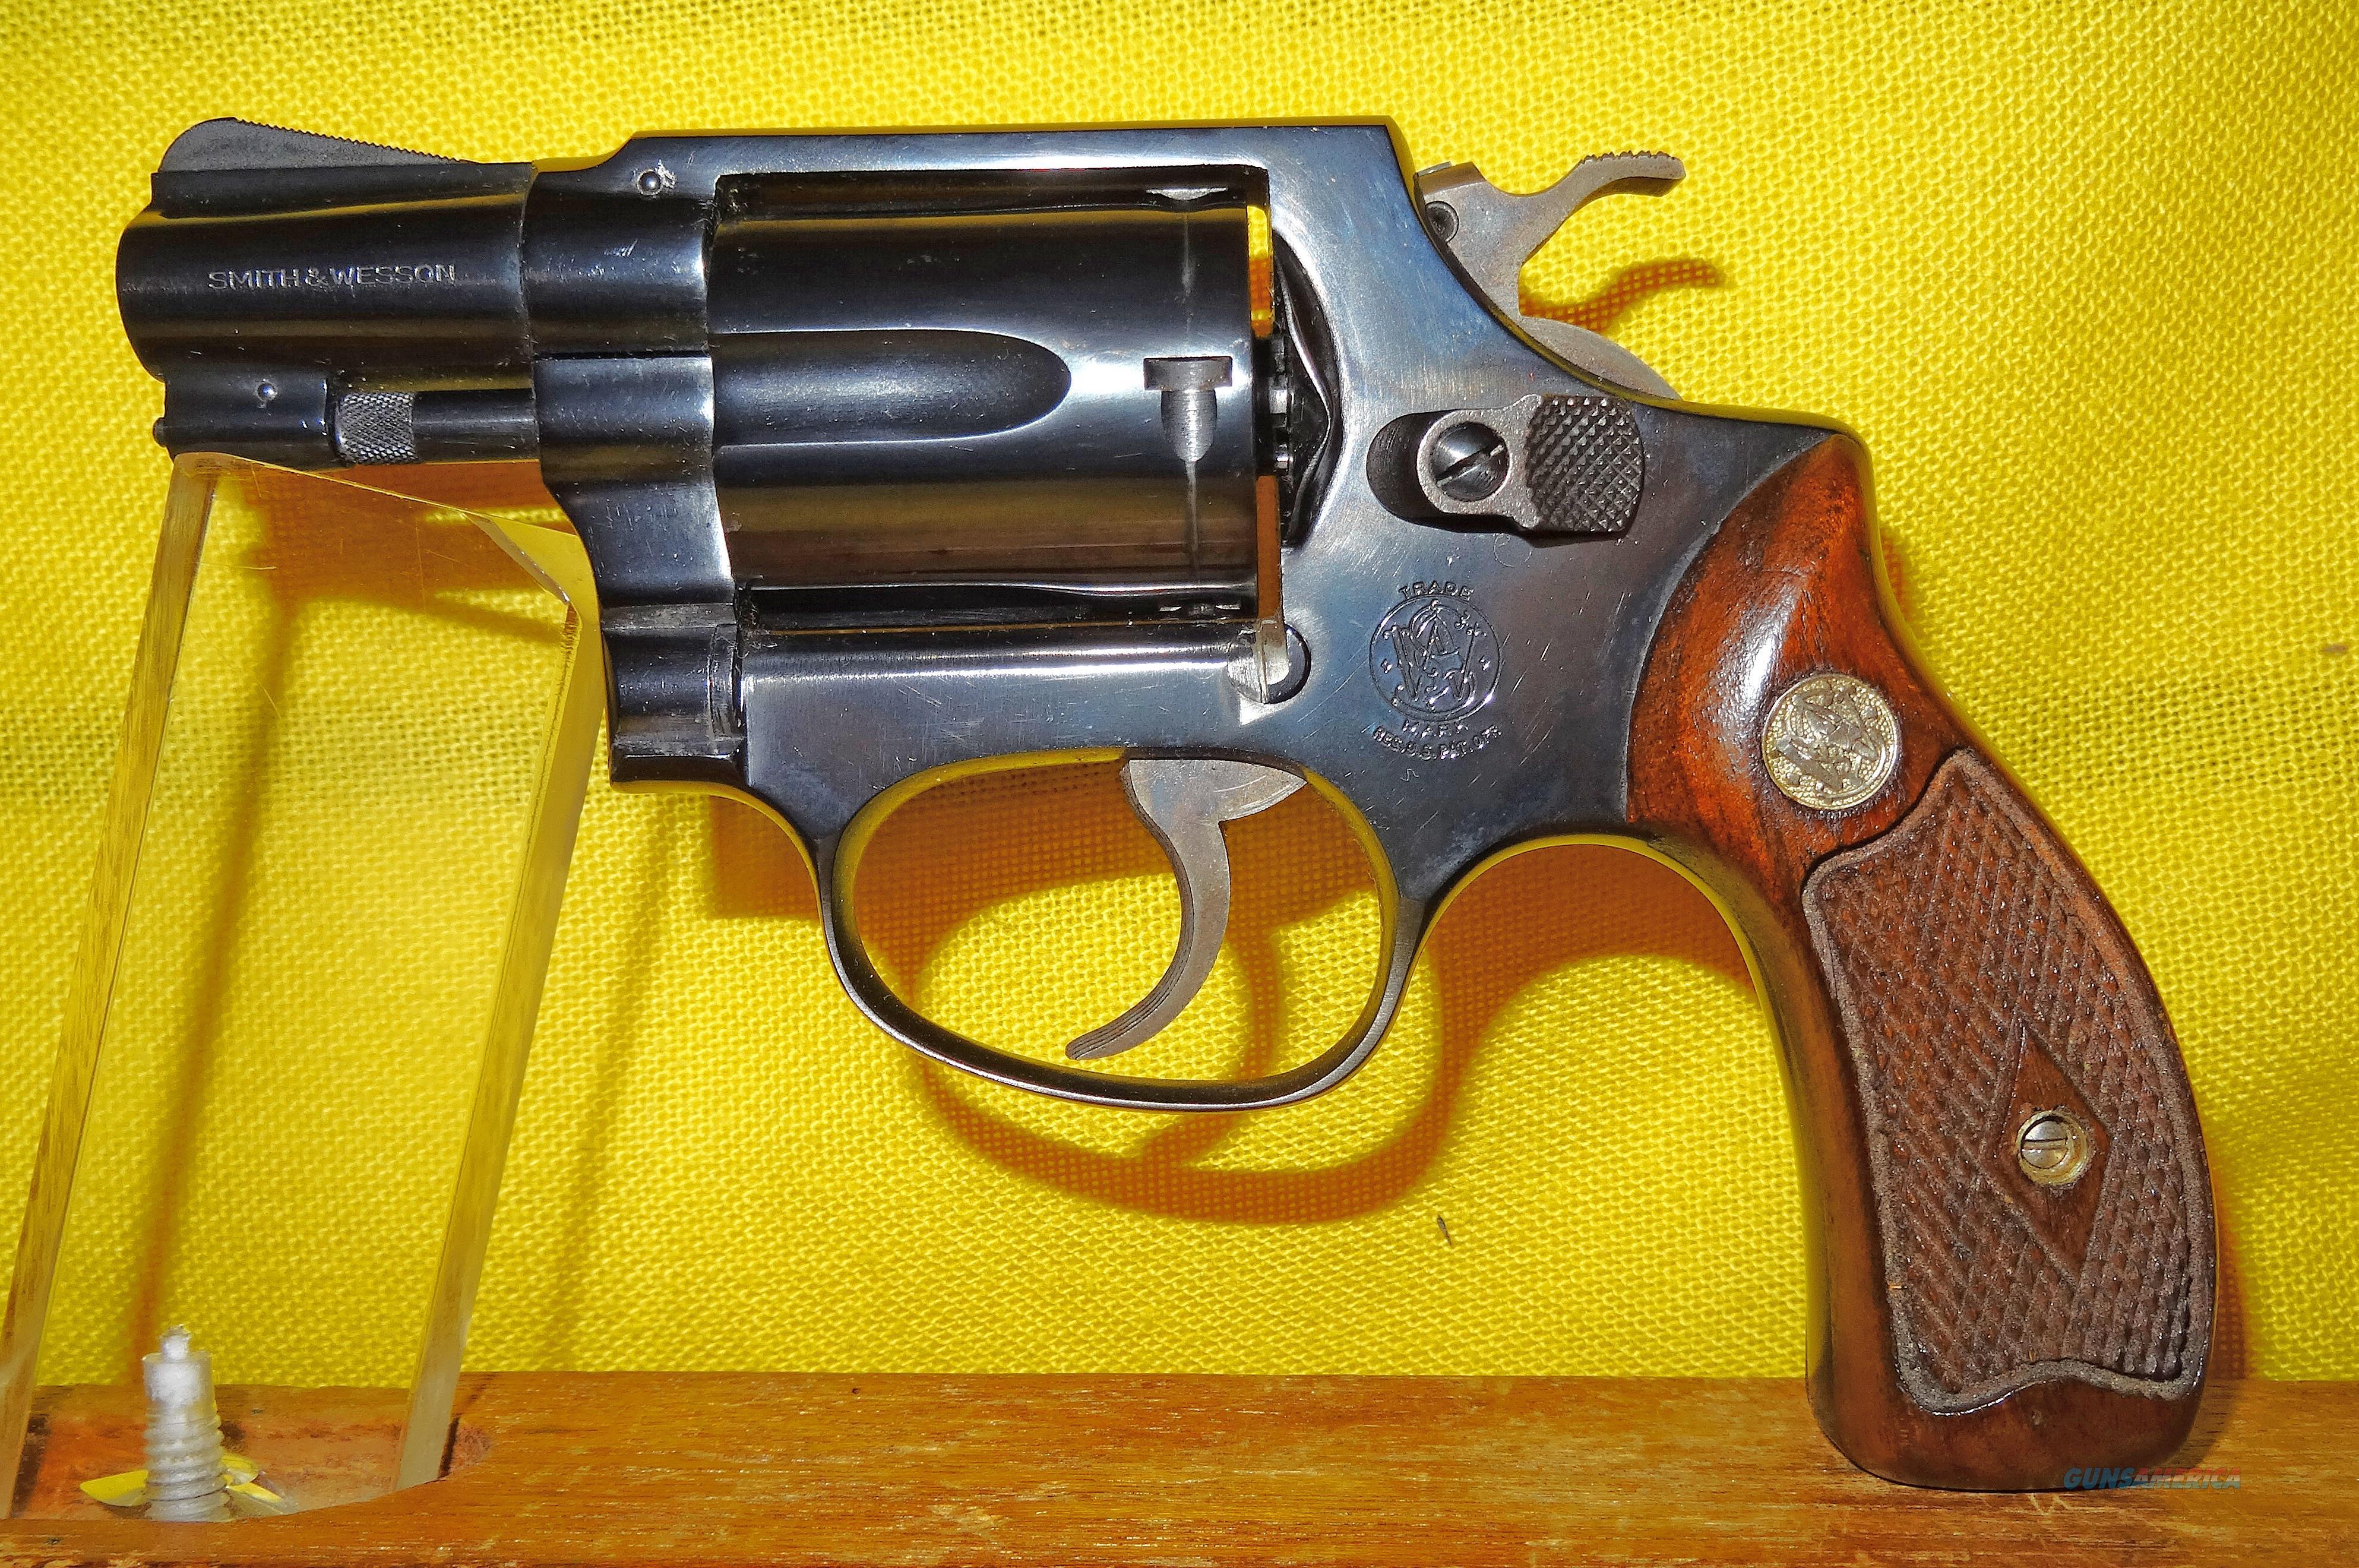 S&W 36  Guns > Pistols > Smith & Wesson Revolvers > Small Frame ( J )